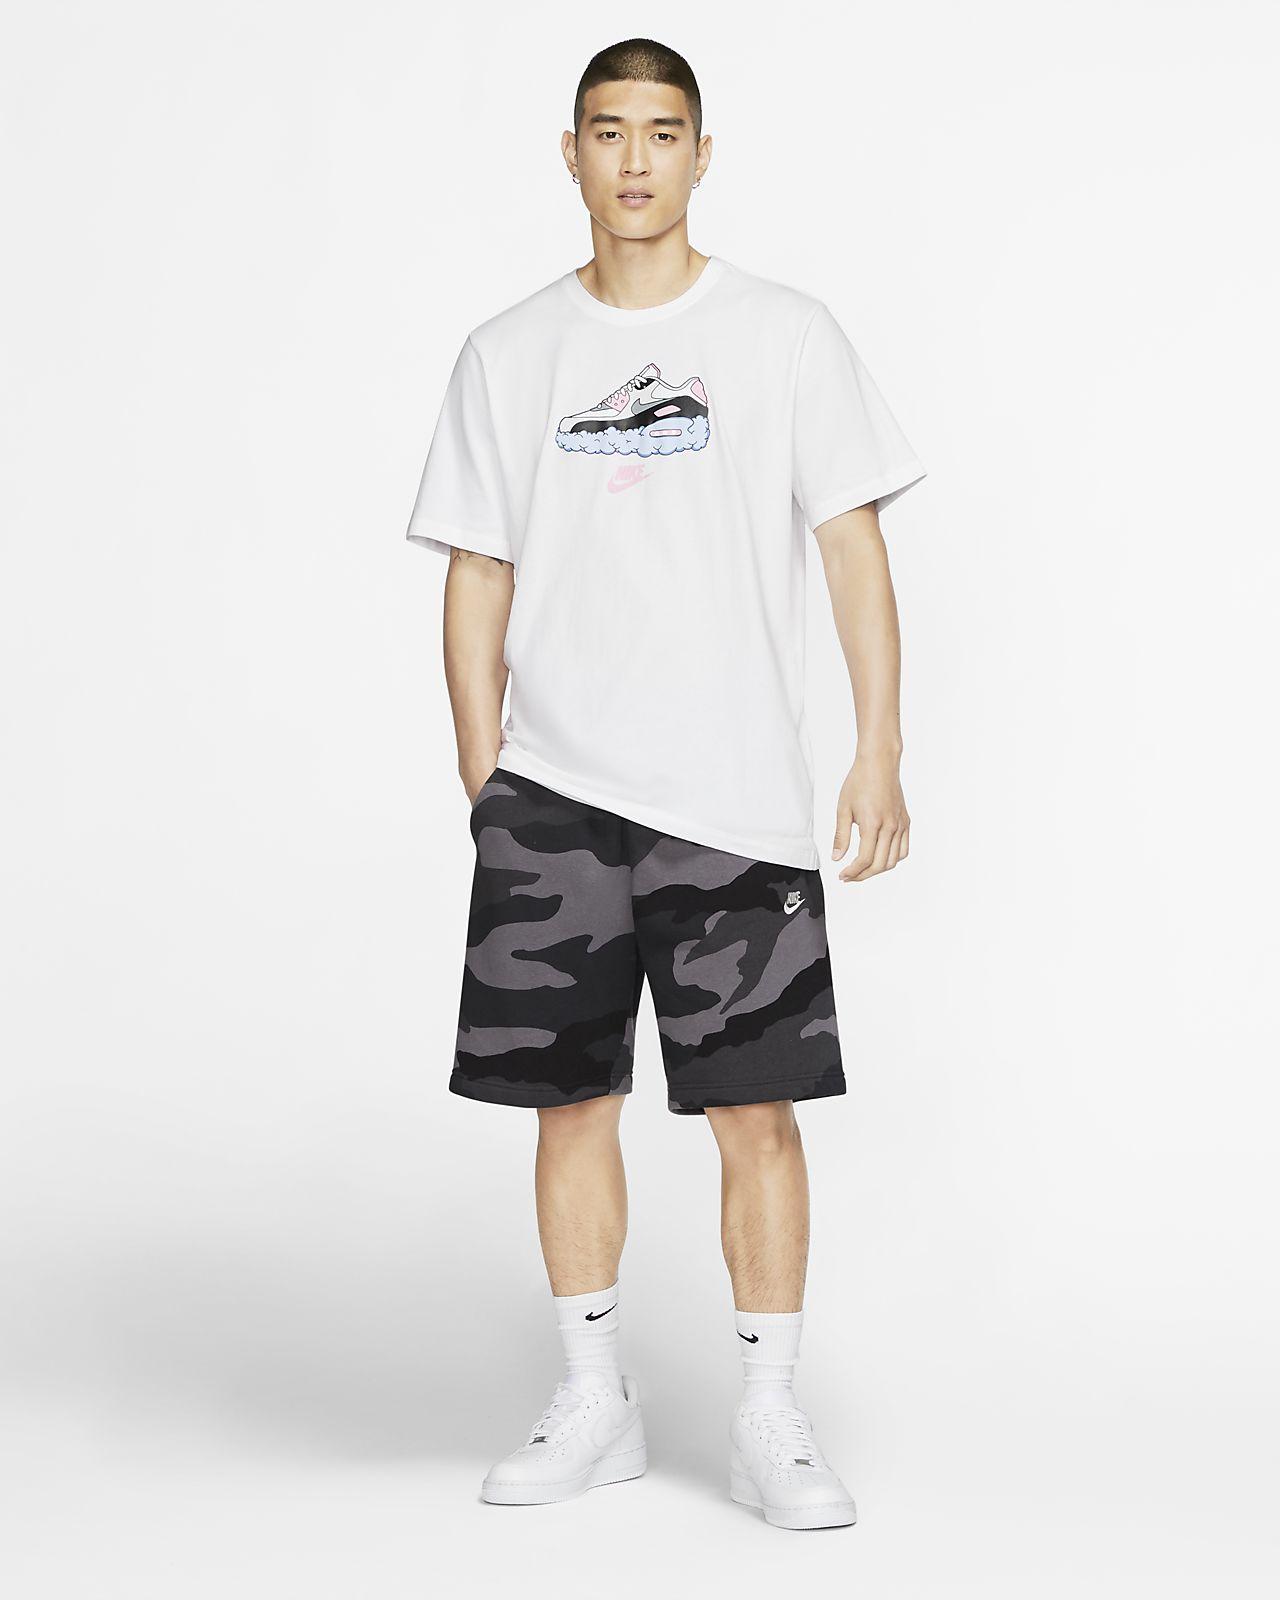 Nike Air Max Men's Shorts Black price from nike in Saudi